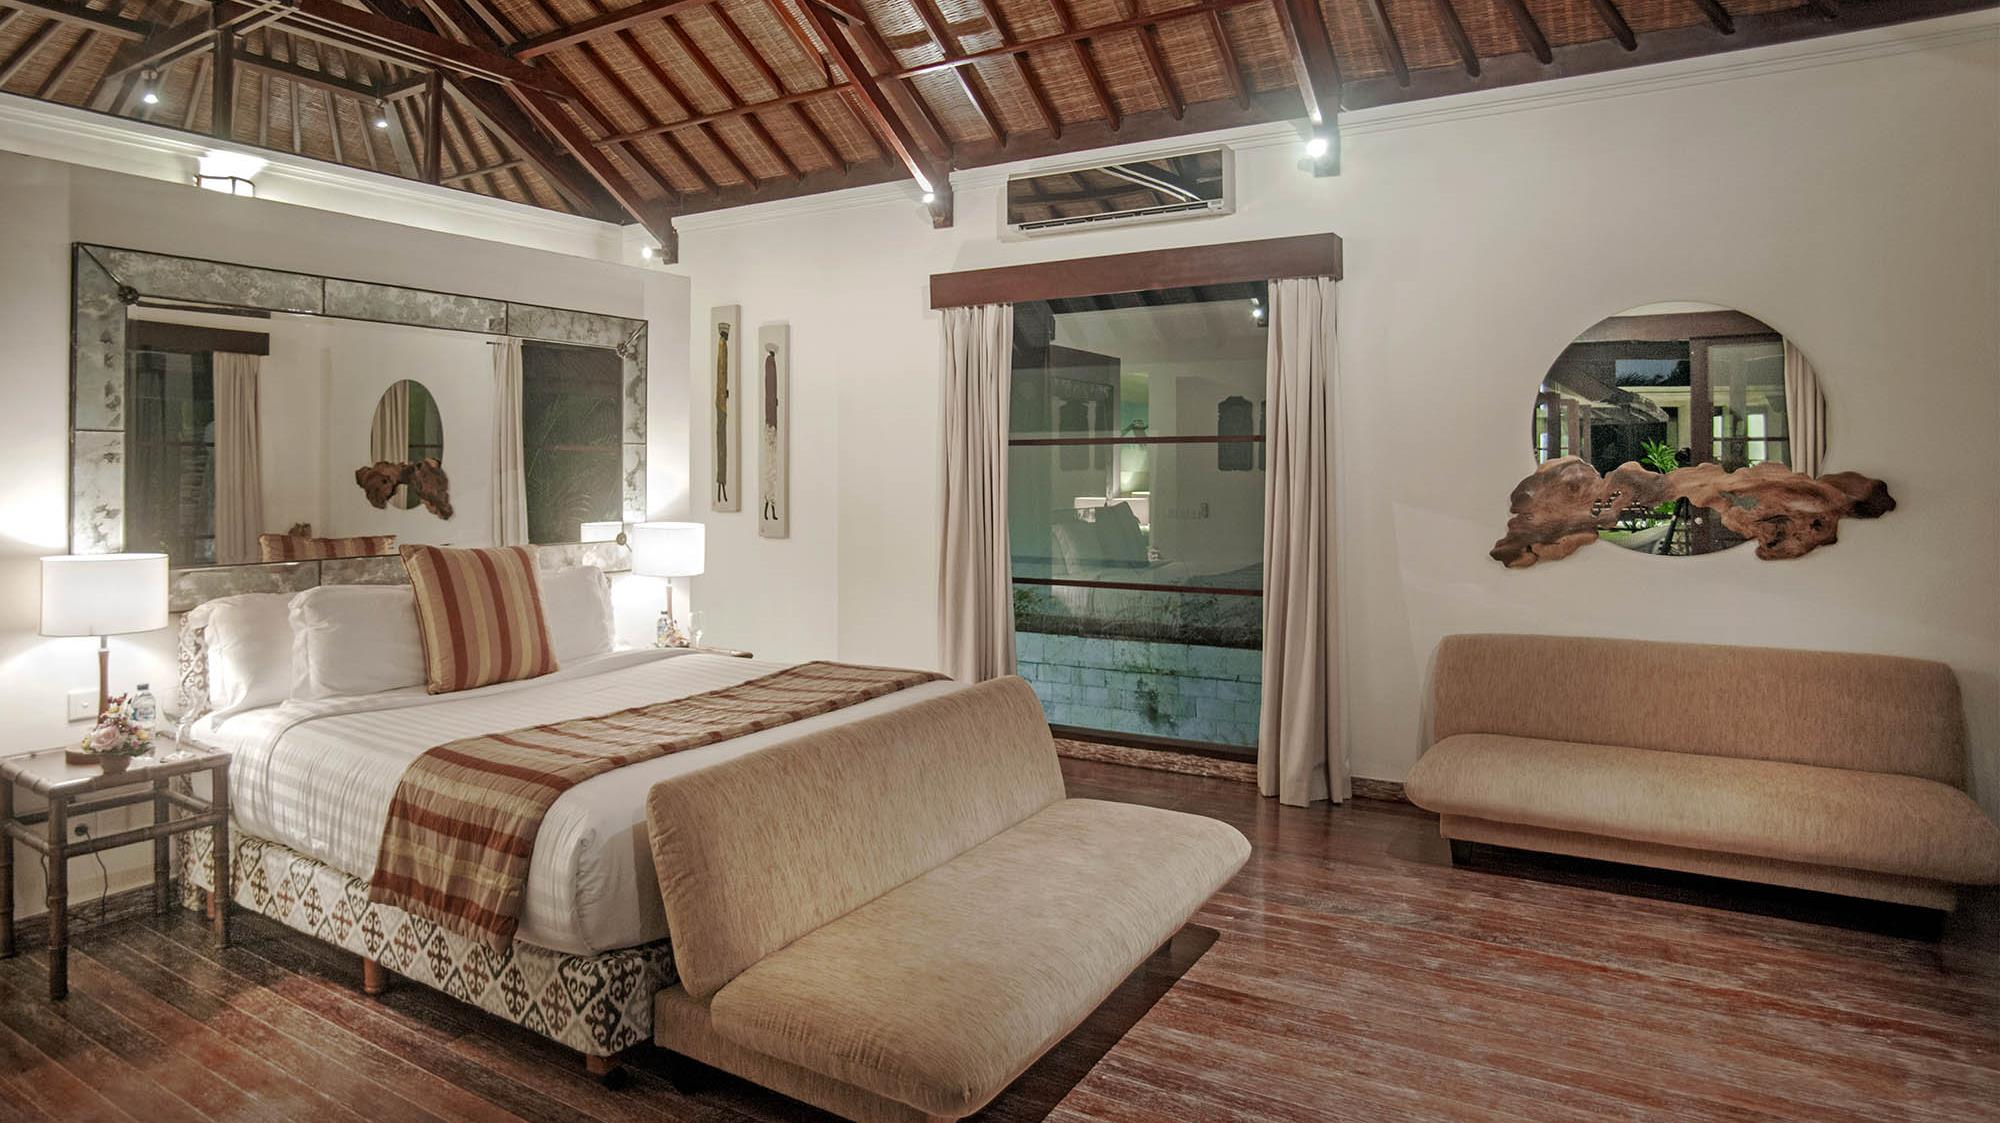 Bedroom with Sofa - Villa Avalon Bali - Canggu, Bali